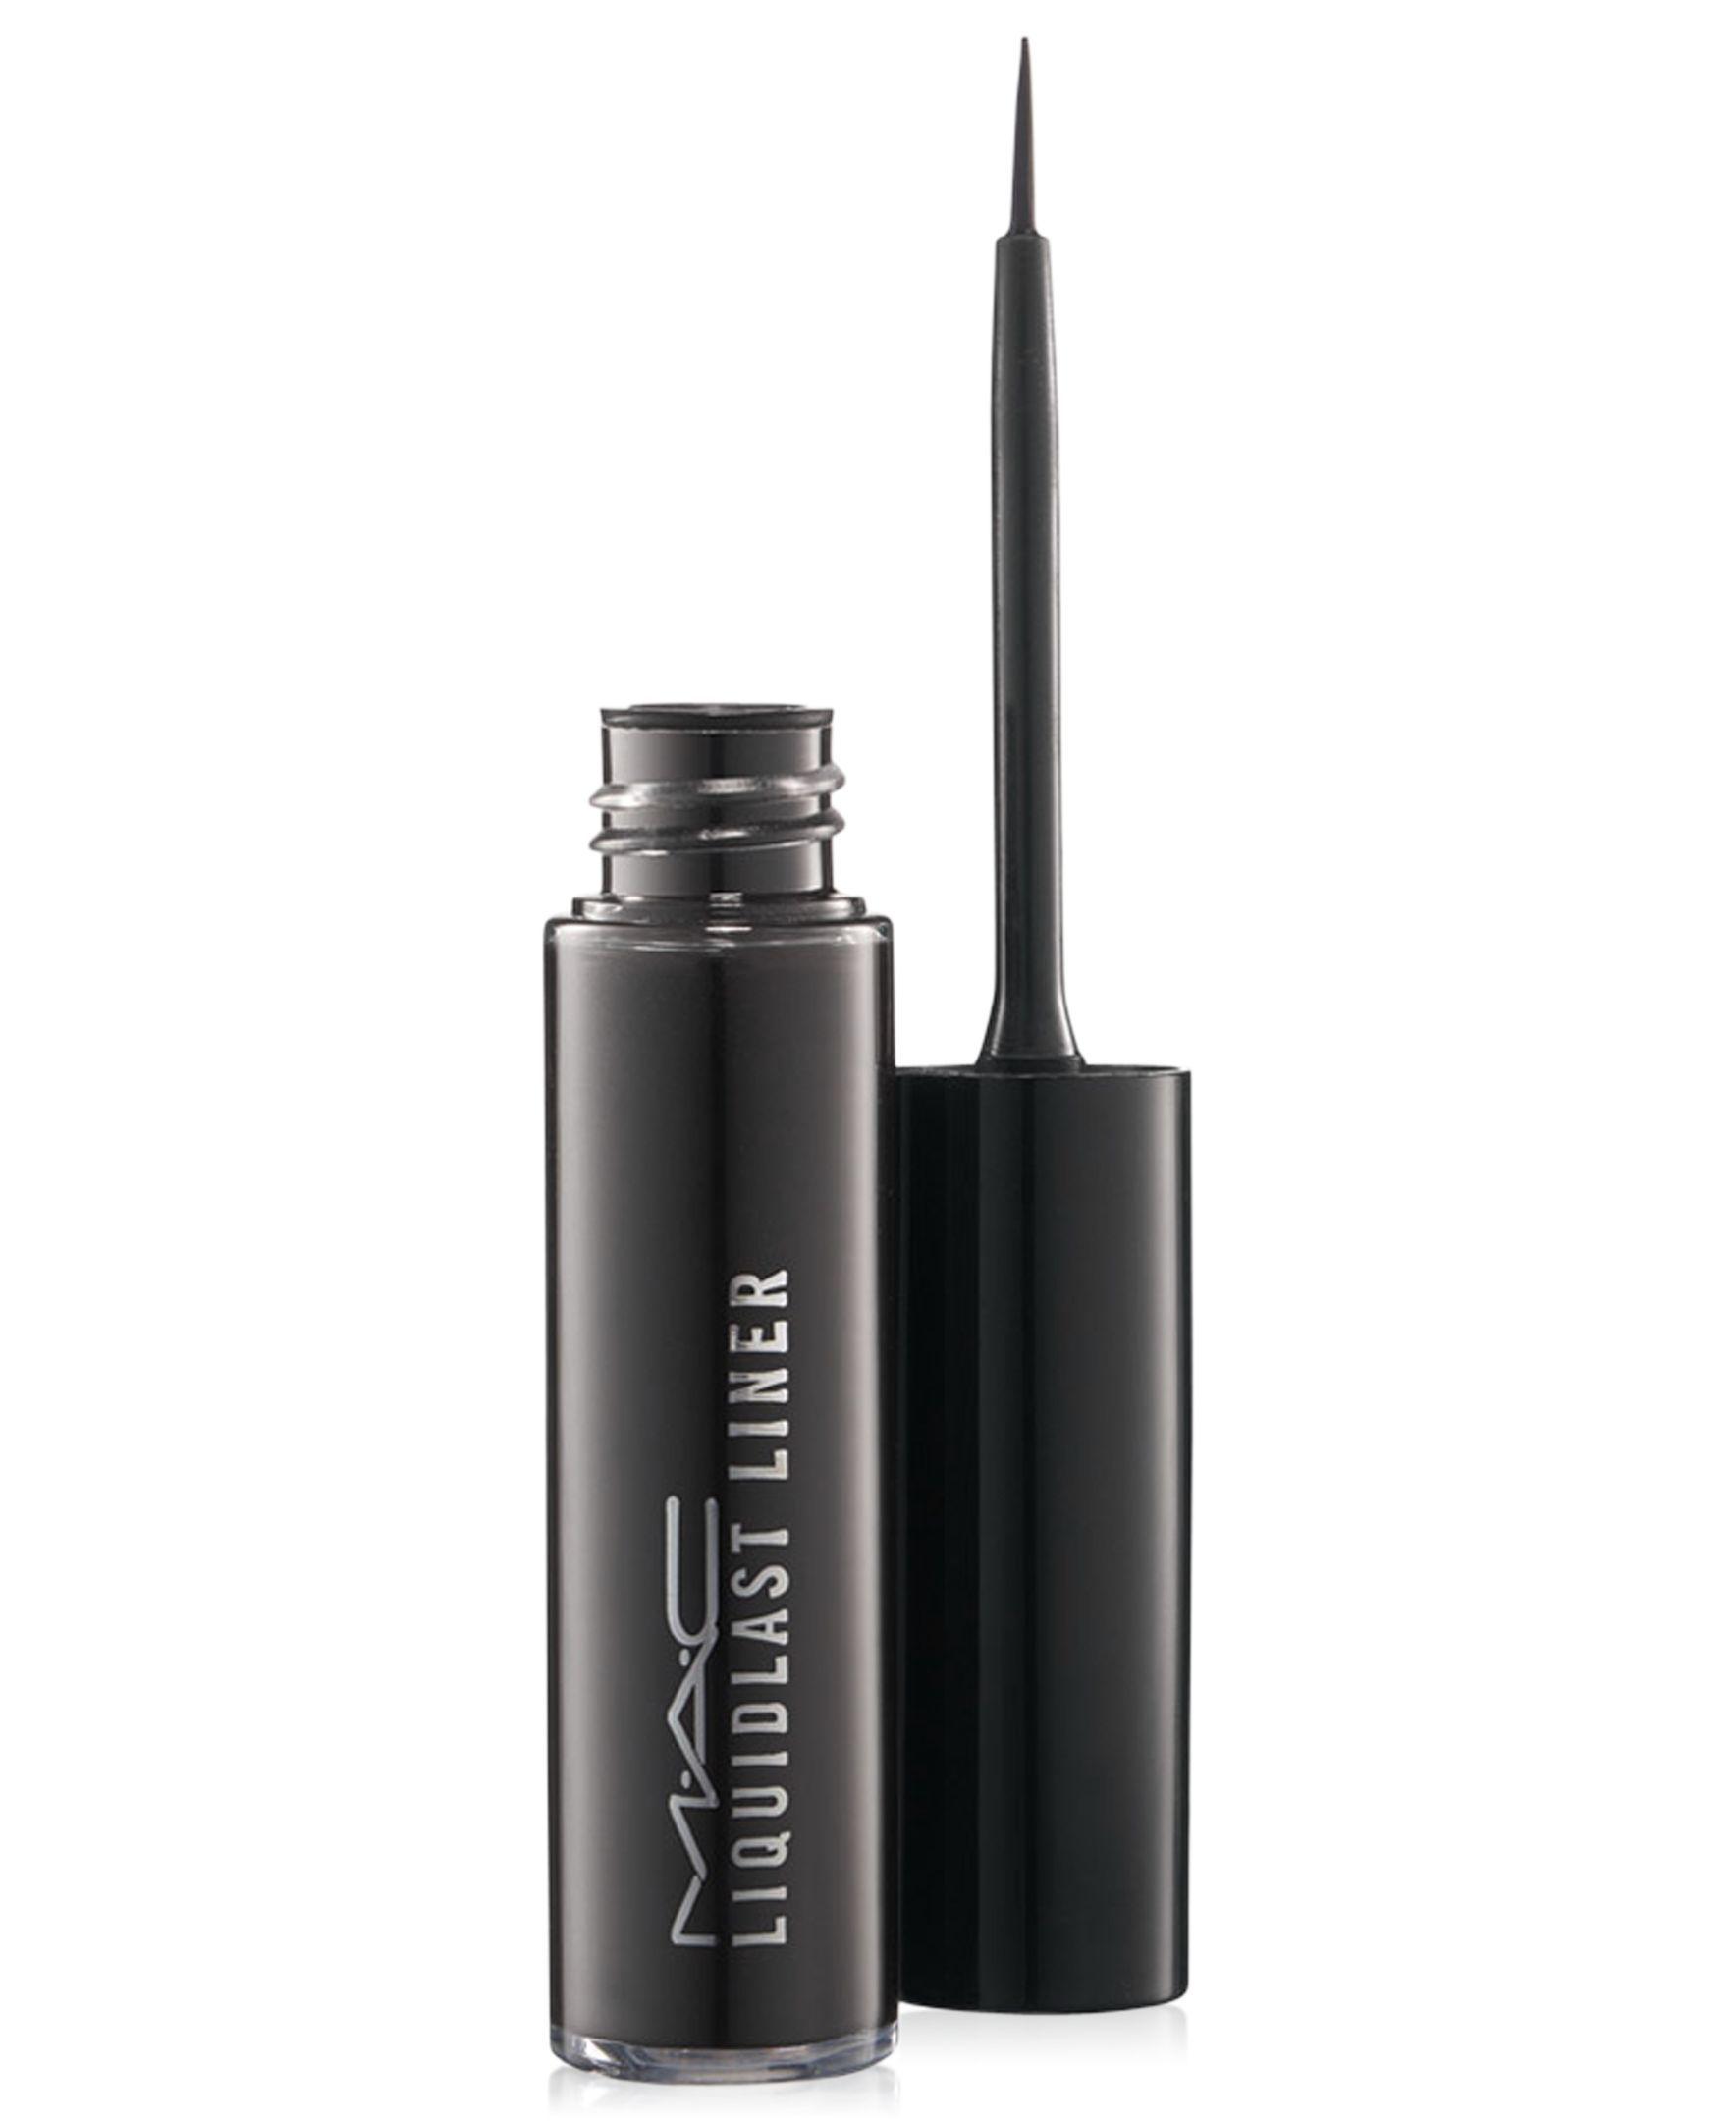 Liquidlast 24-Hour Waterproof Liner   Best waterproof eyeliner, Eyeliner, Mac  eyeliner